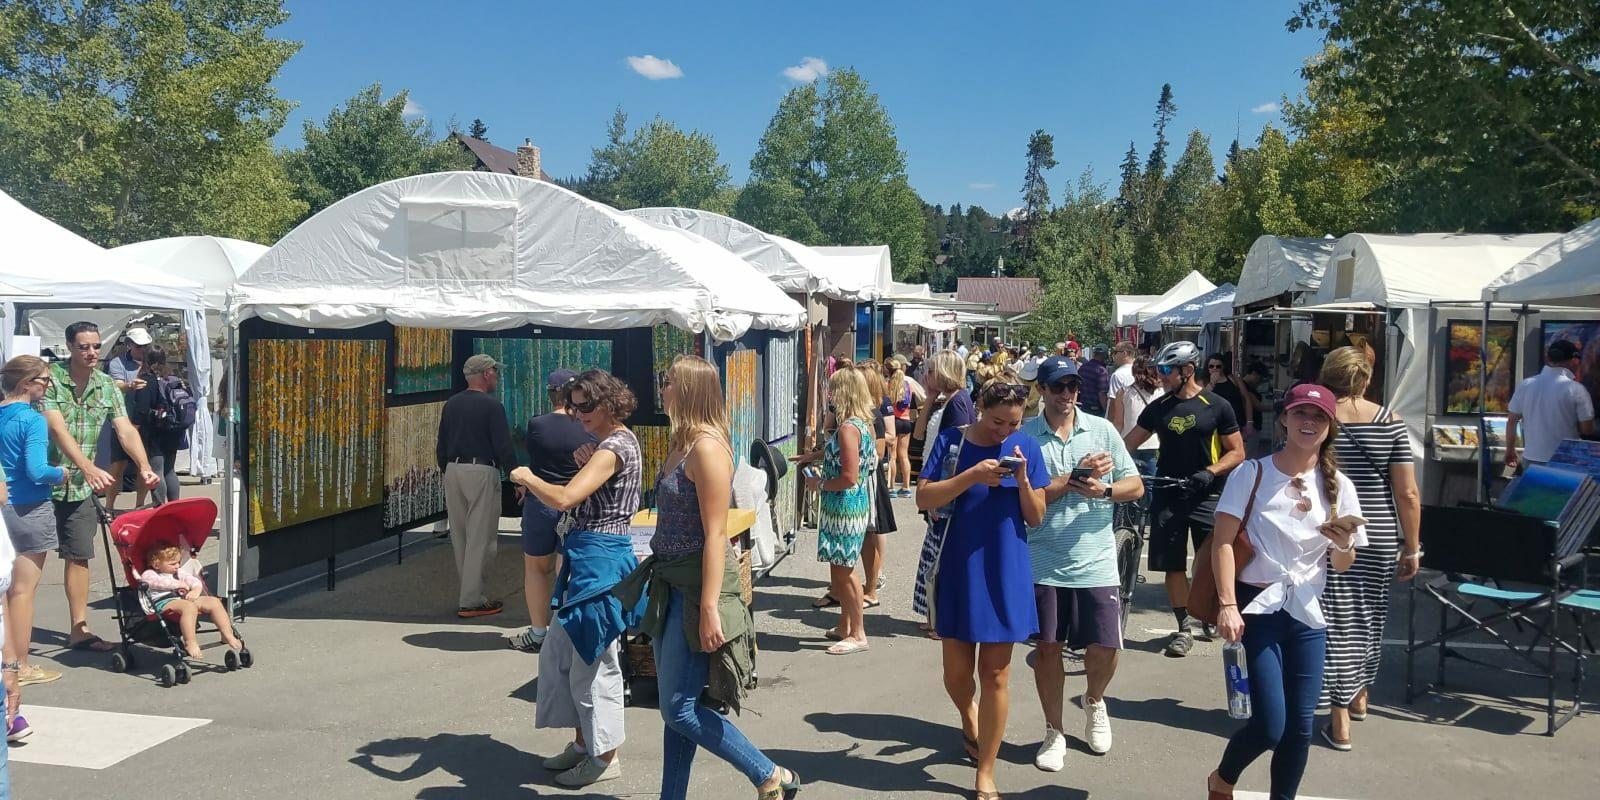 Breckenridge Gathering at the Great Divide Art Festival Colorado